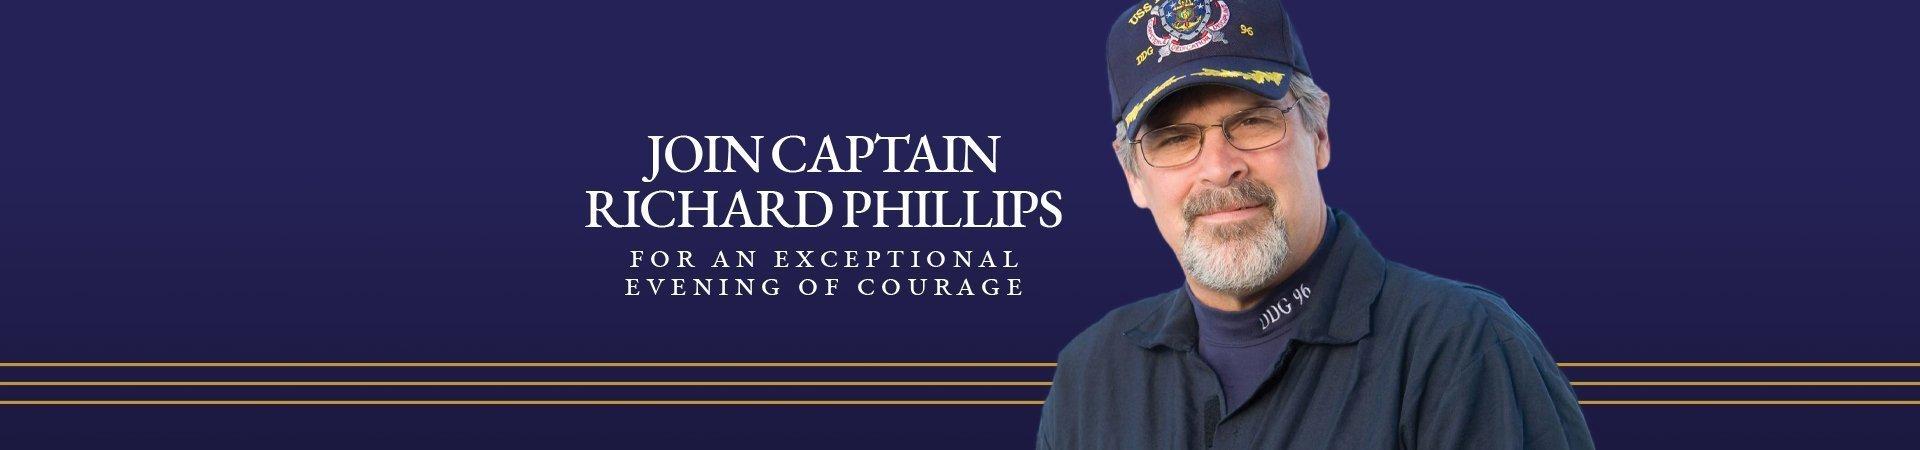 Captain Richard Phillips Fundraising Event at Kurn Hattin Homes for Children- Rescheduled